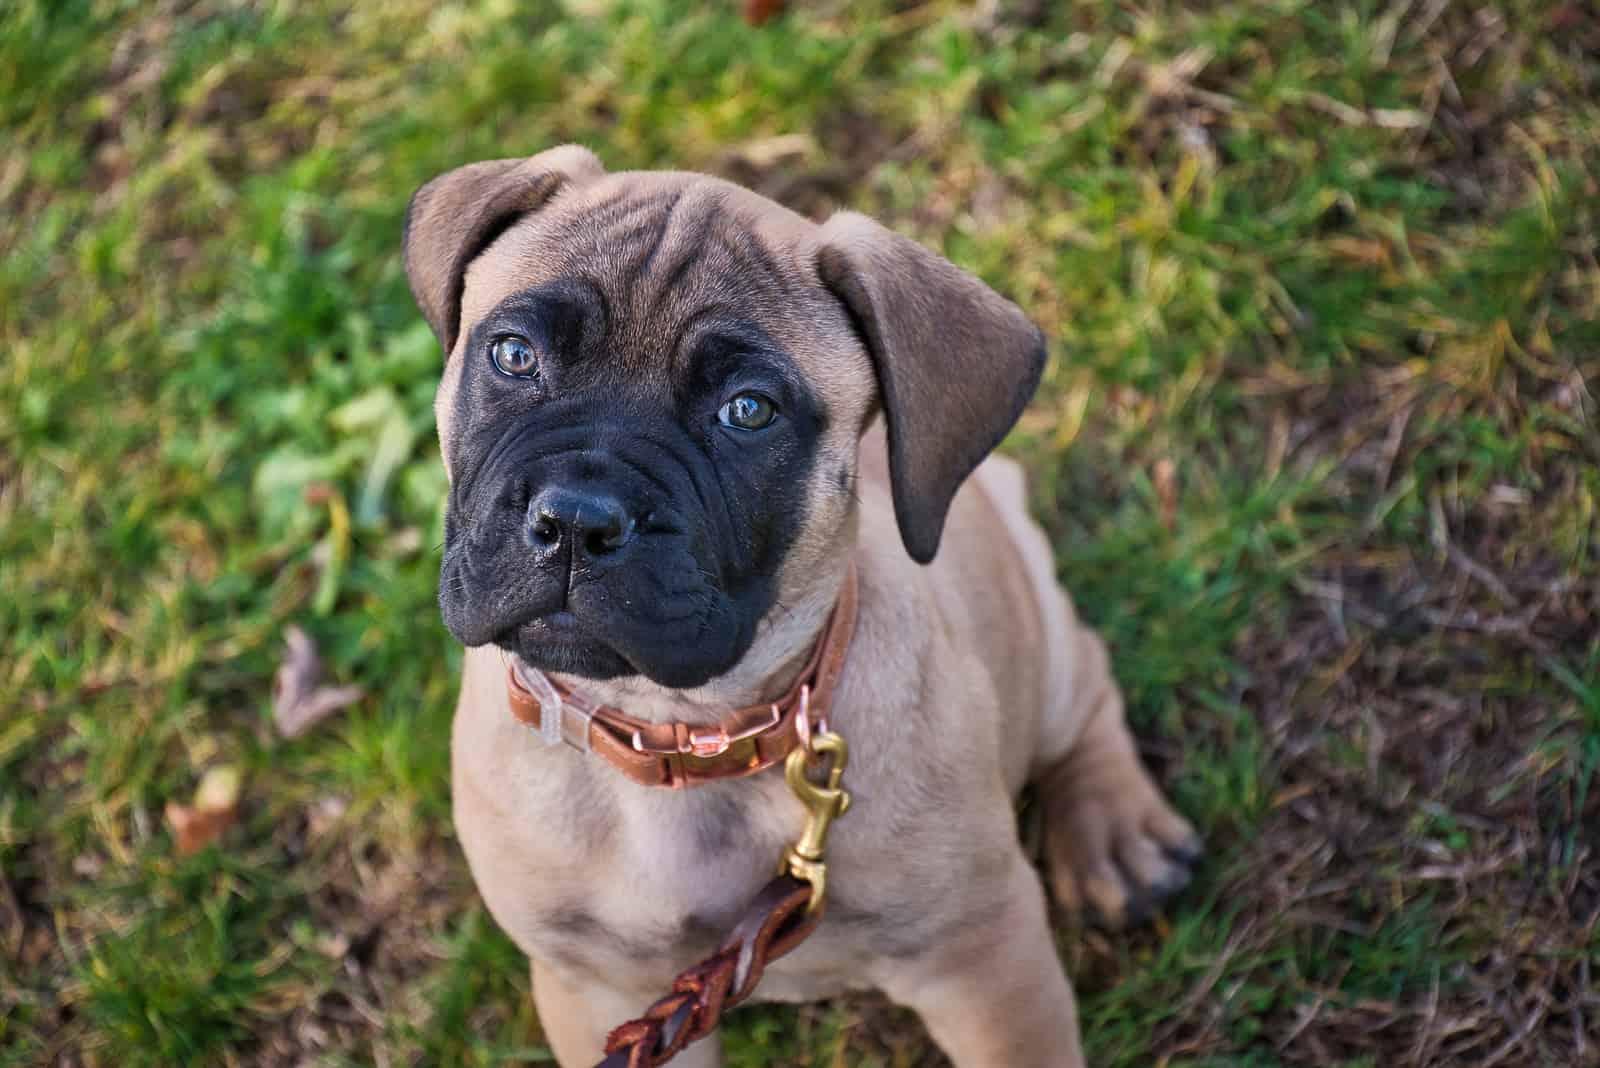 adorable little bullmastiff puppy on the grass